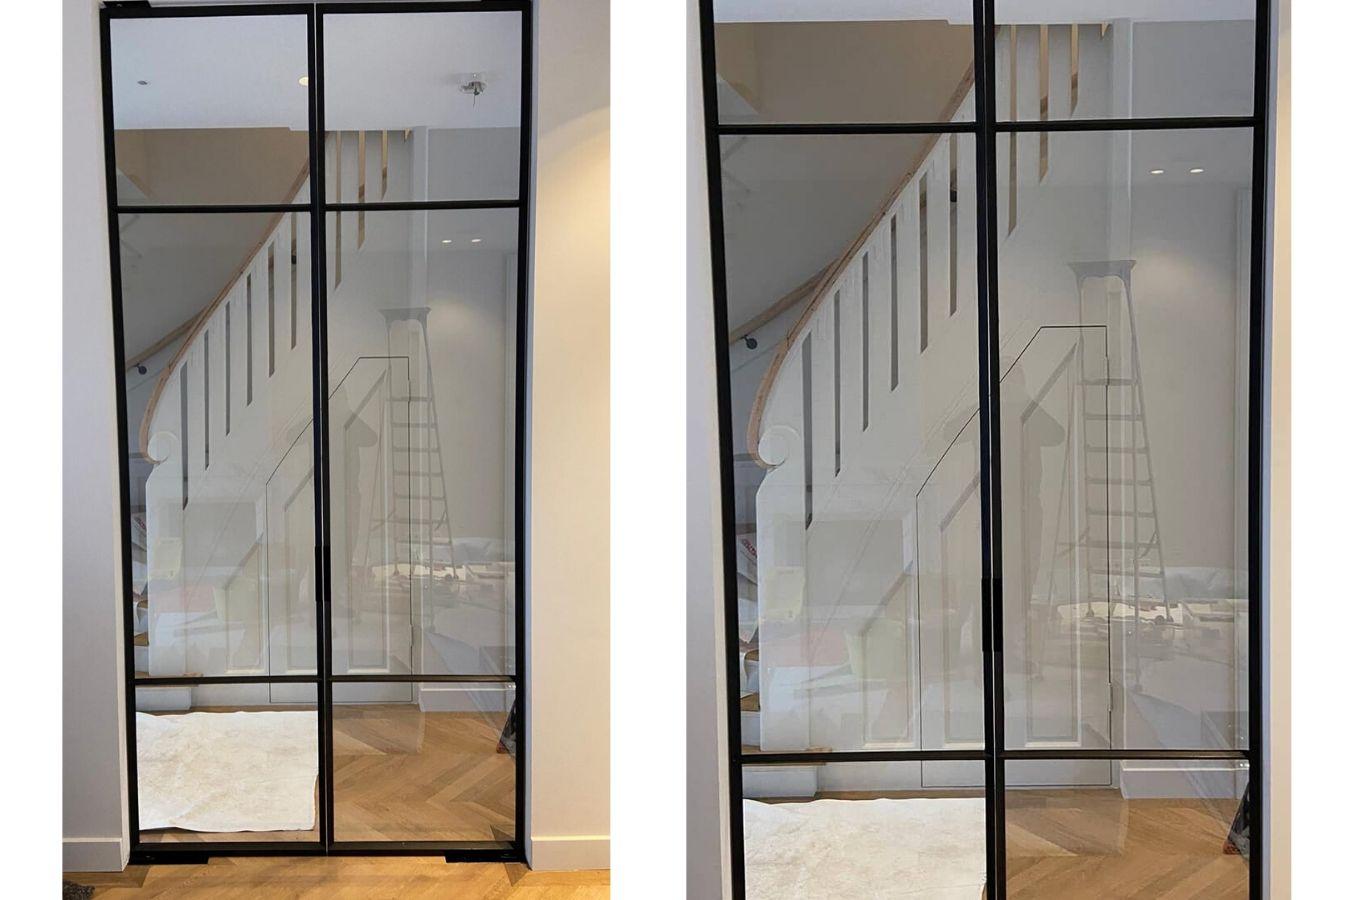 dubbele stalen pivotdeuren in Amsterdam, retrosteel, dubbele pivotdeuren, stalen taatsdeuren, StalenDeurenHuys